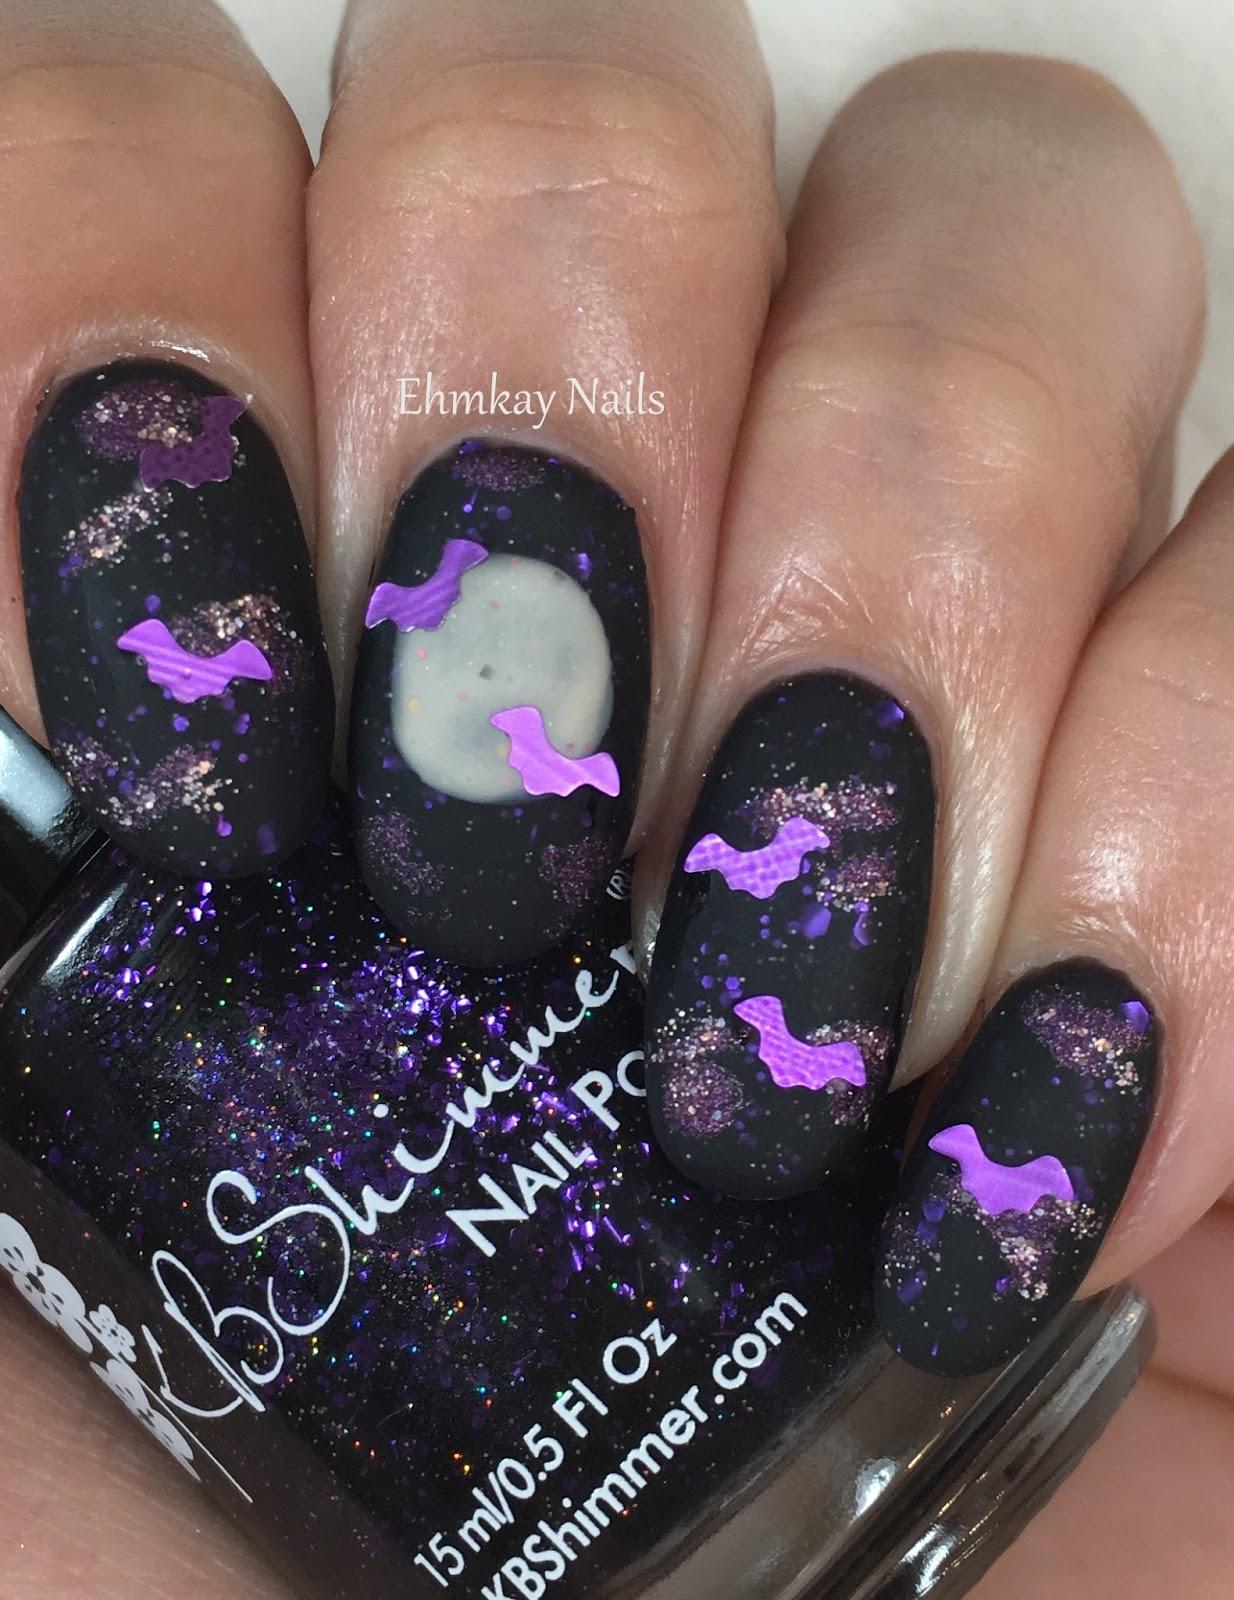 Ehmkay Nails Halloween Nail Art Bats And Full Moon Art With